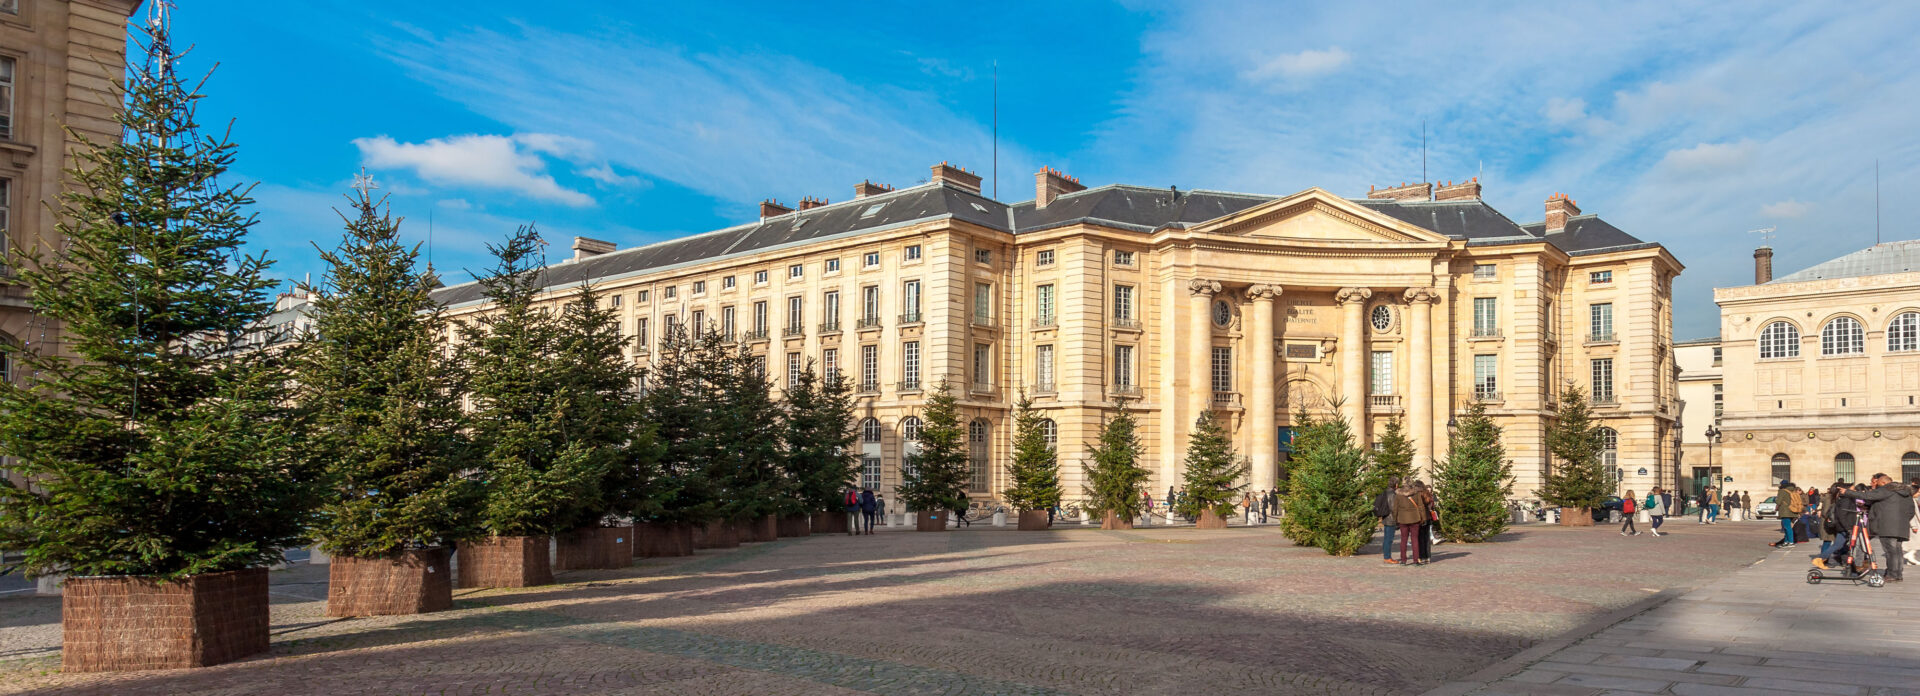 Sorbonne Pantheon universitet Paris Latinerkvarteret